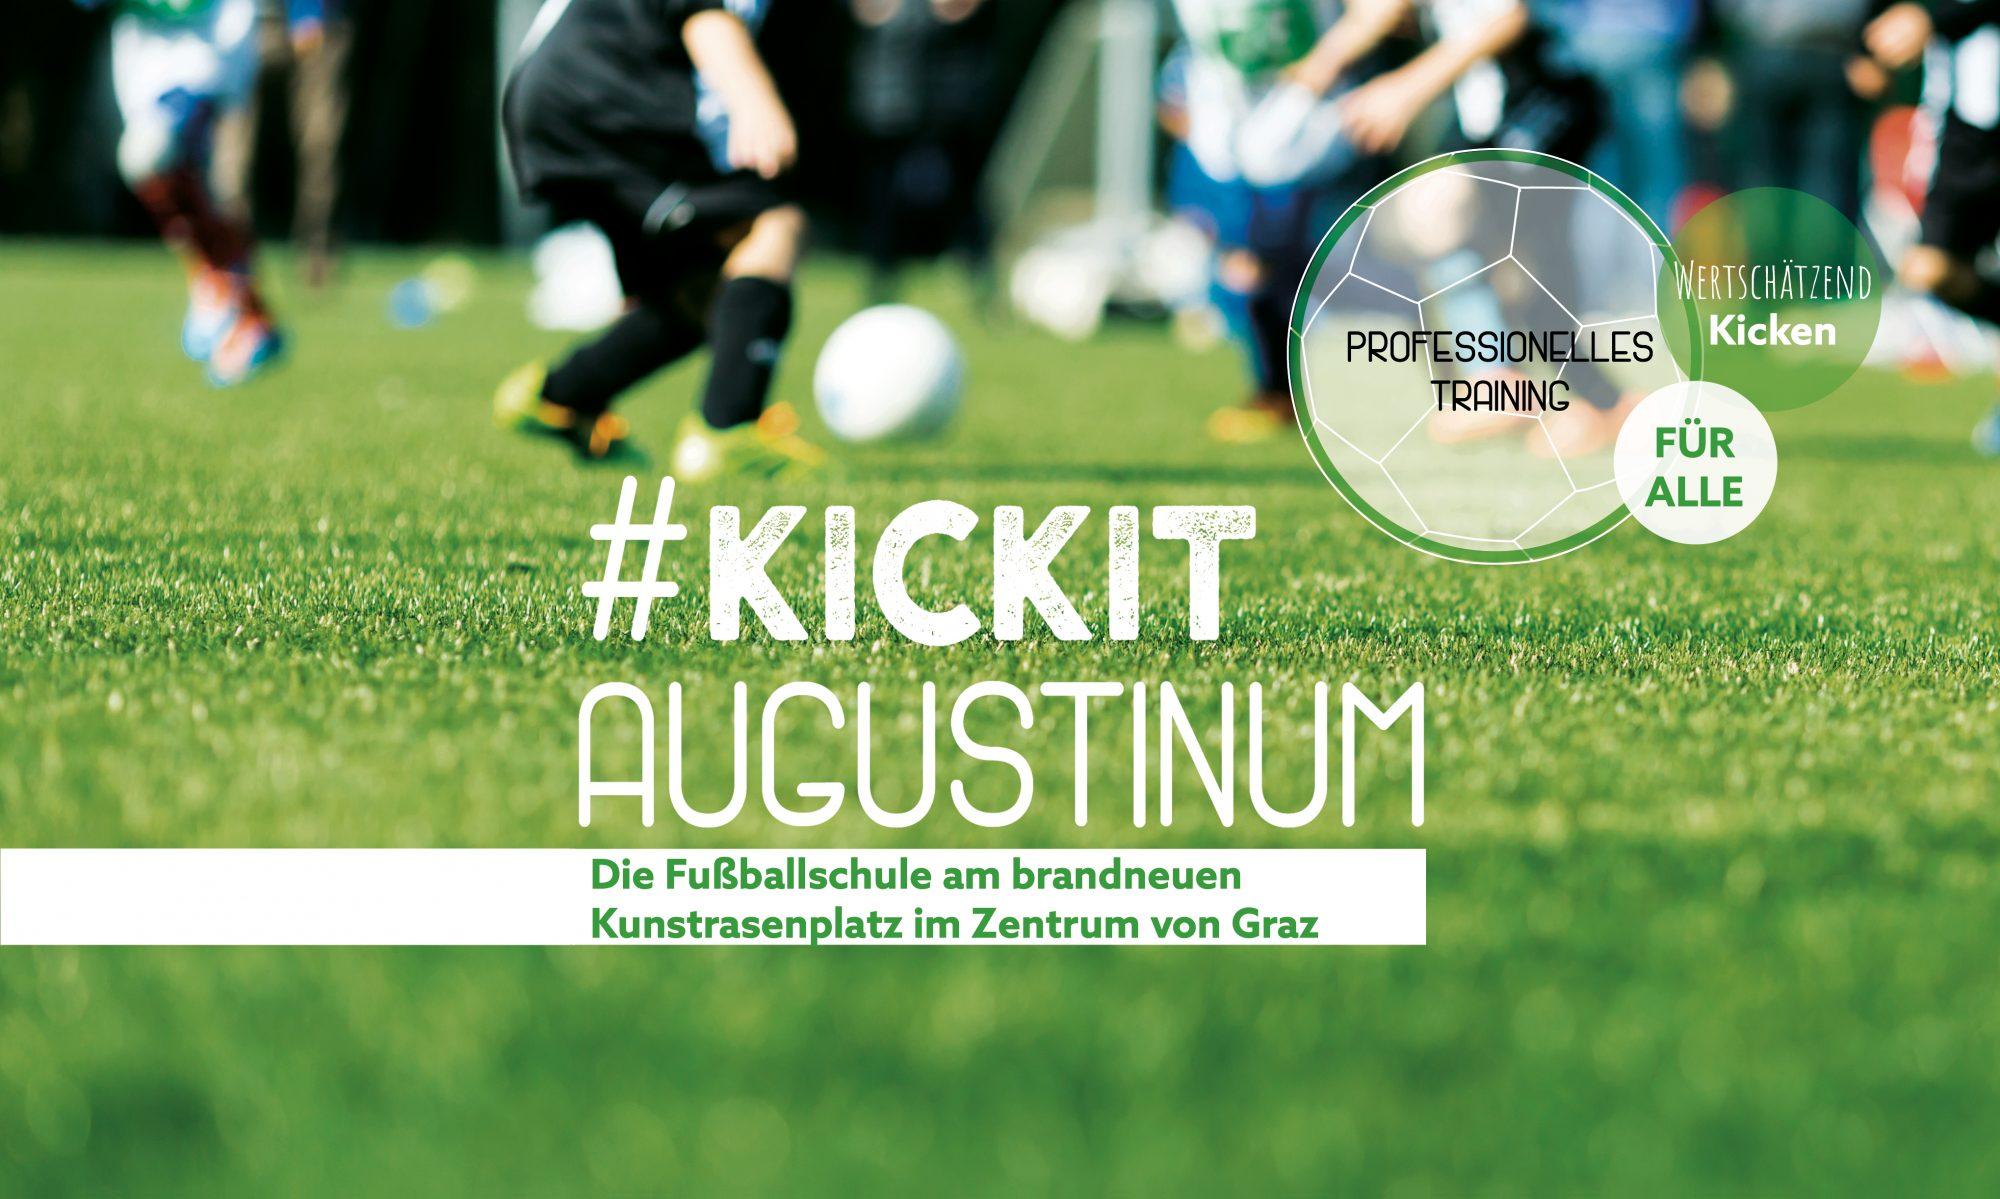 #KICKIT - Augustinum